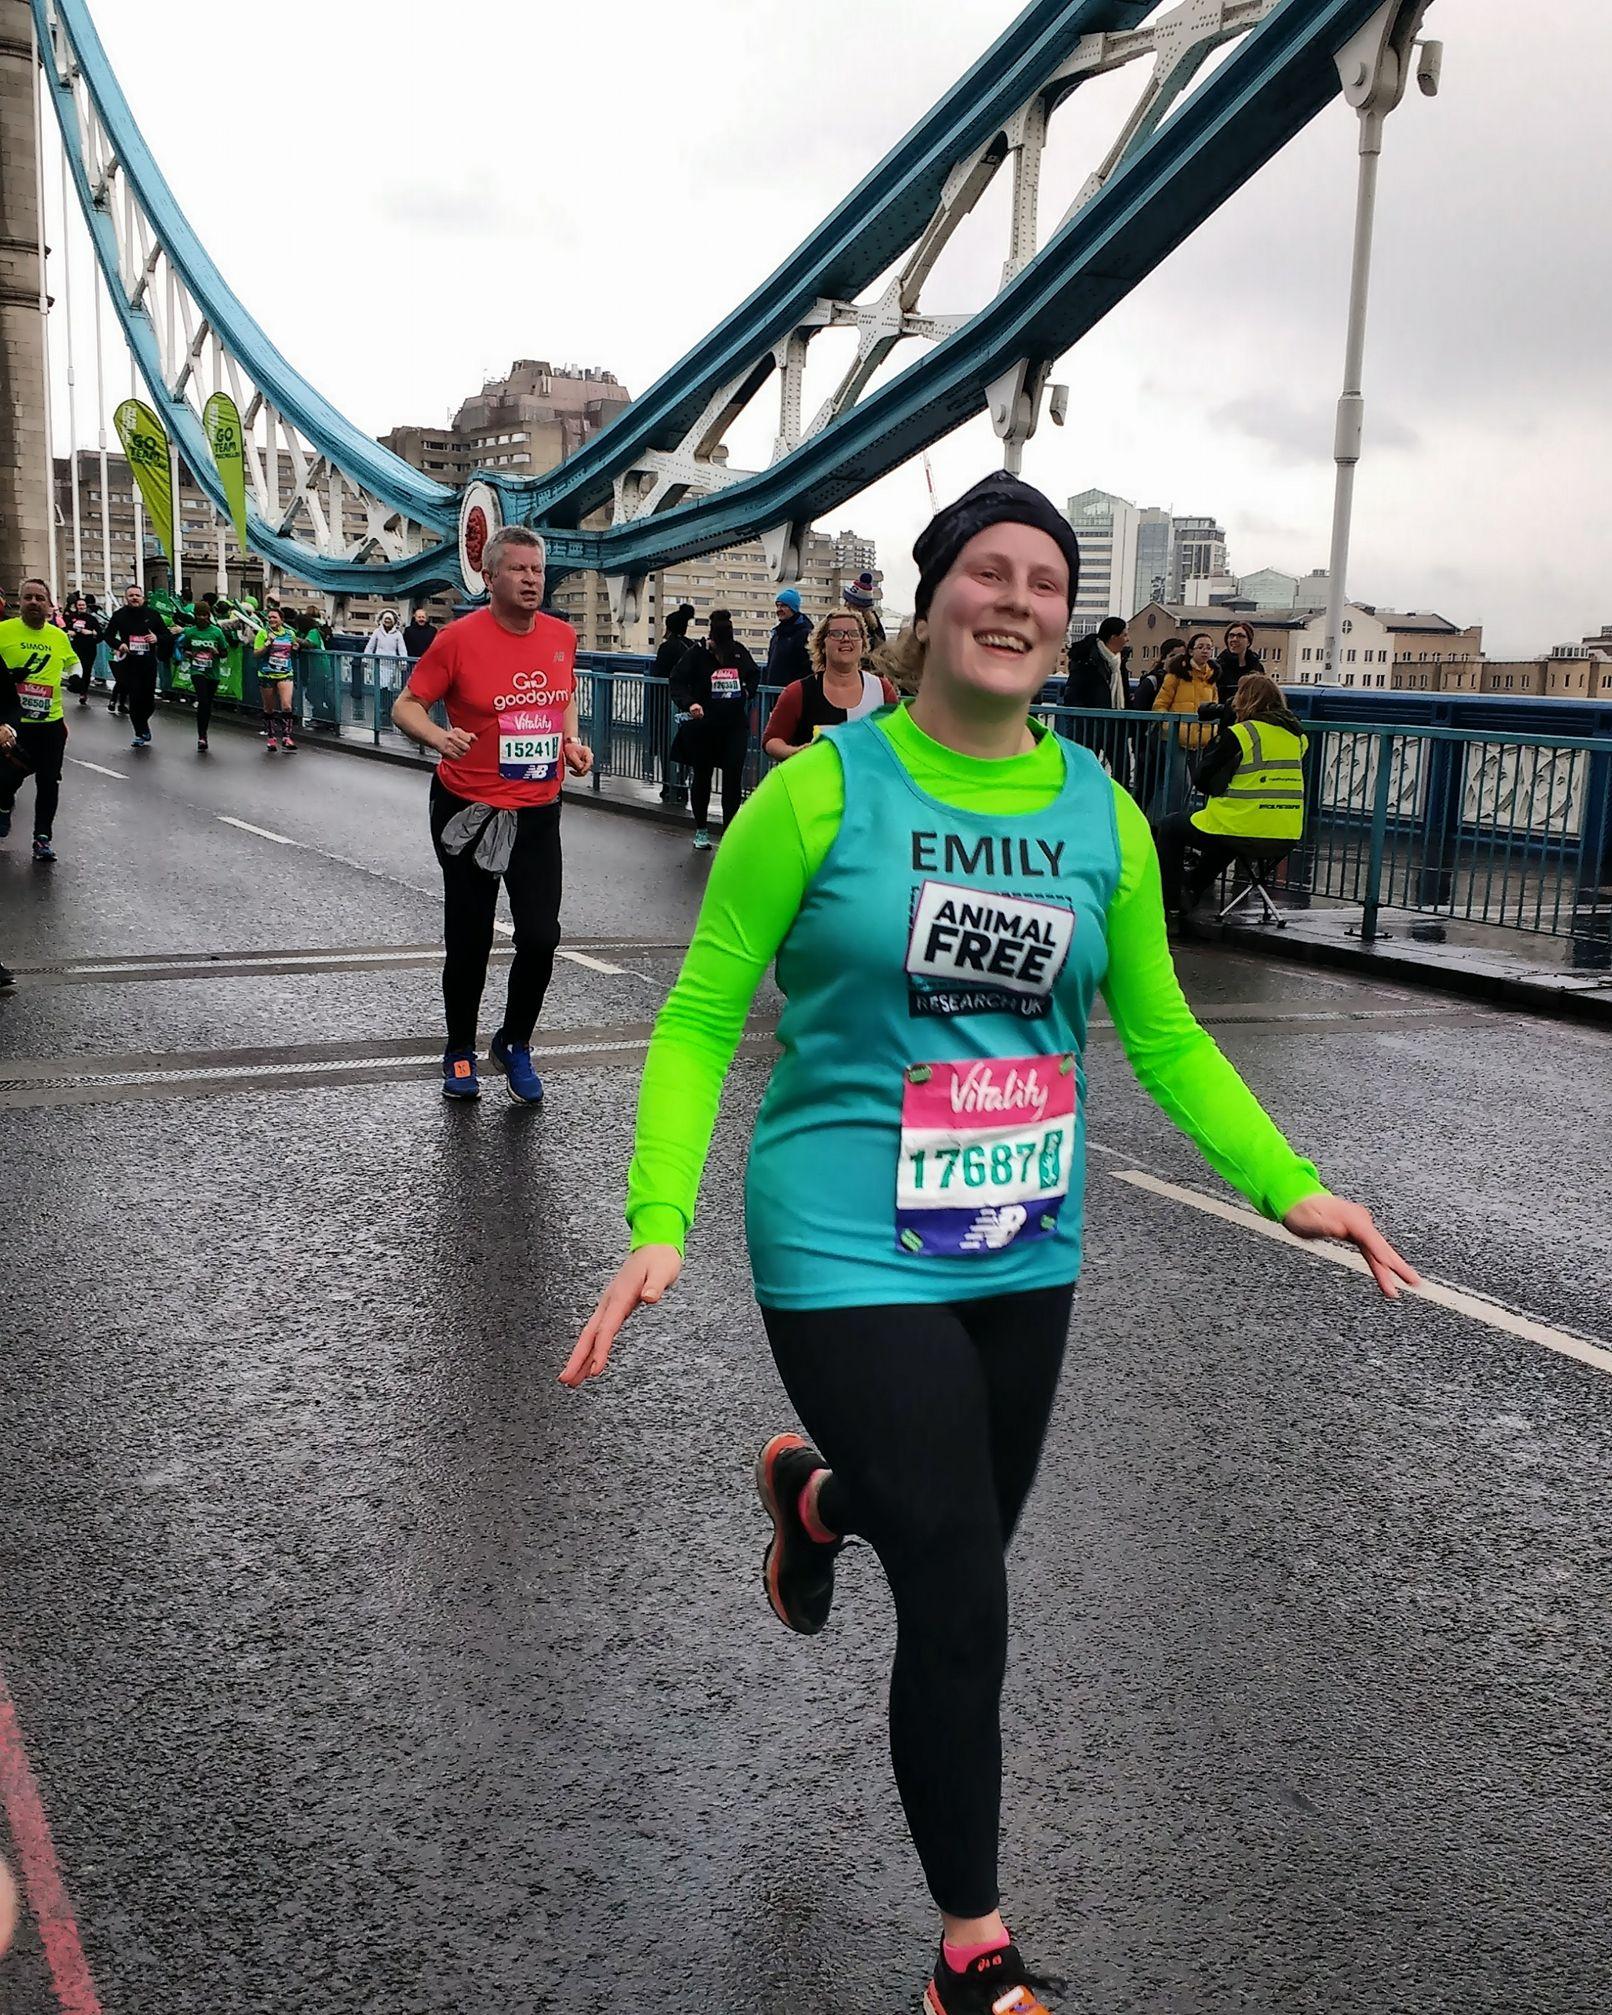 A woman running the Big Half